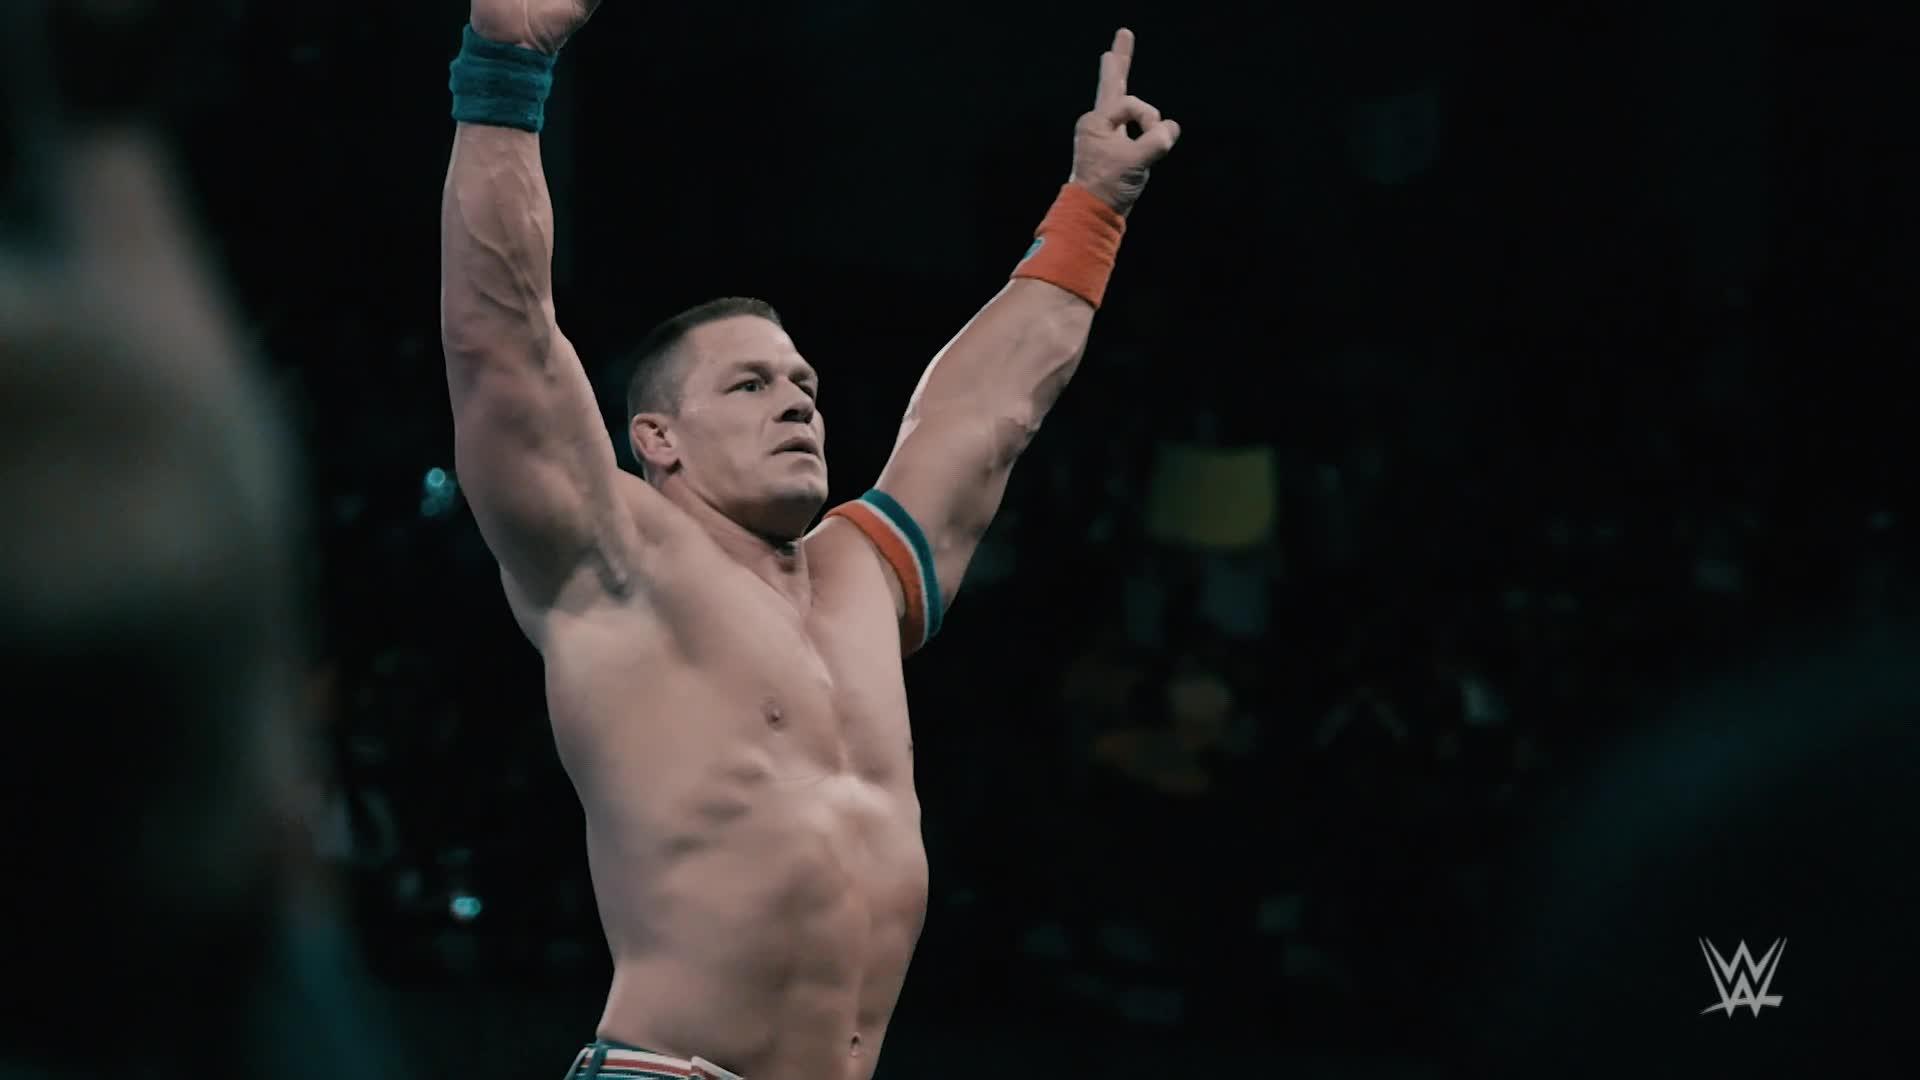 Étonnant ralenti de John Cena vs. Baron Corbin: WWE.com Exclusive, 15 jan. 2017